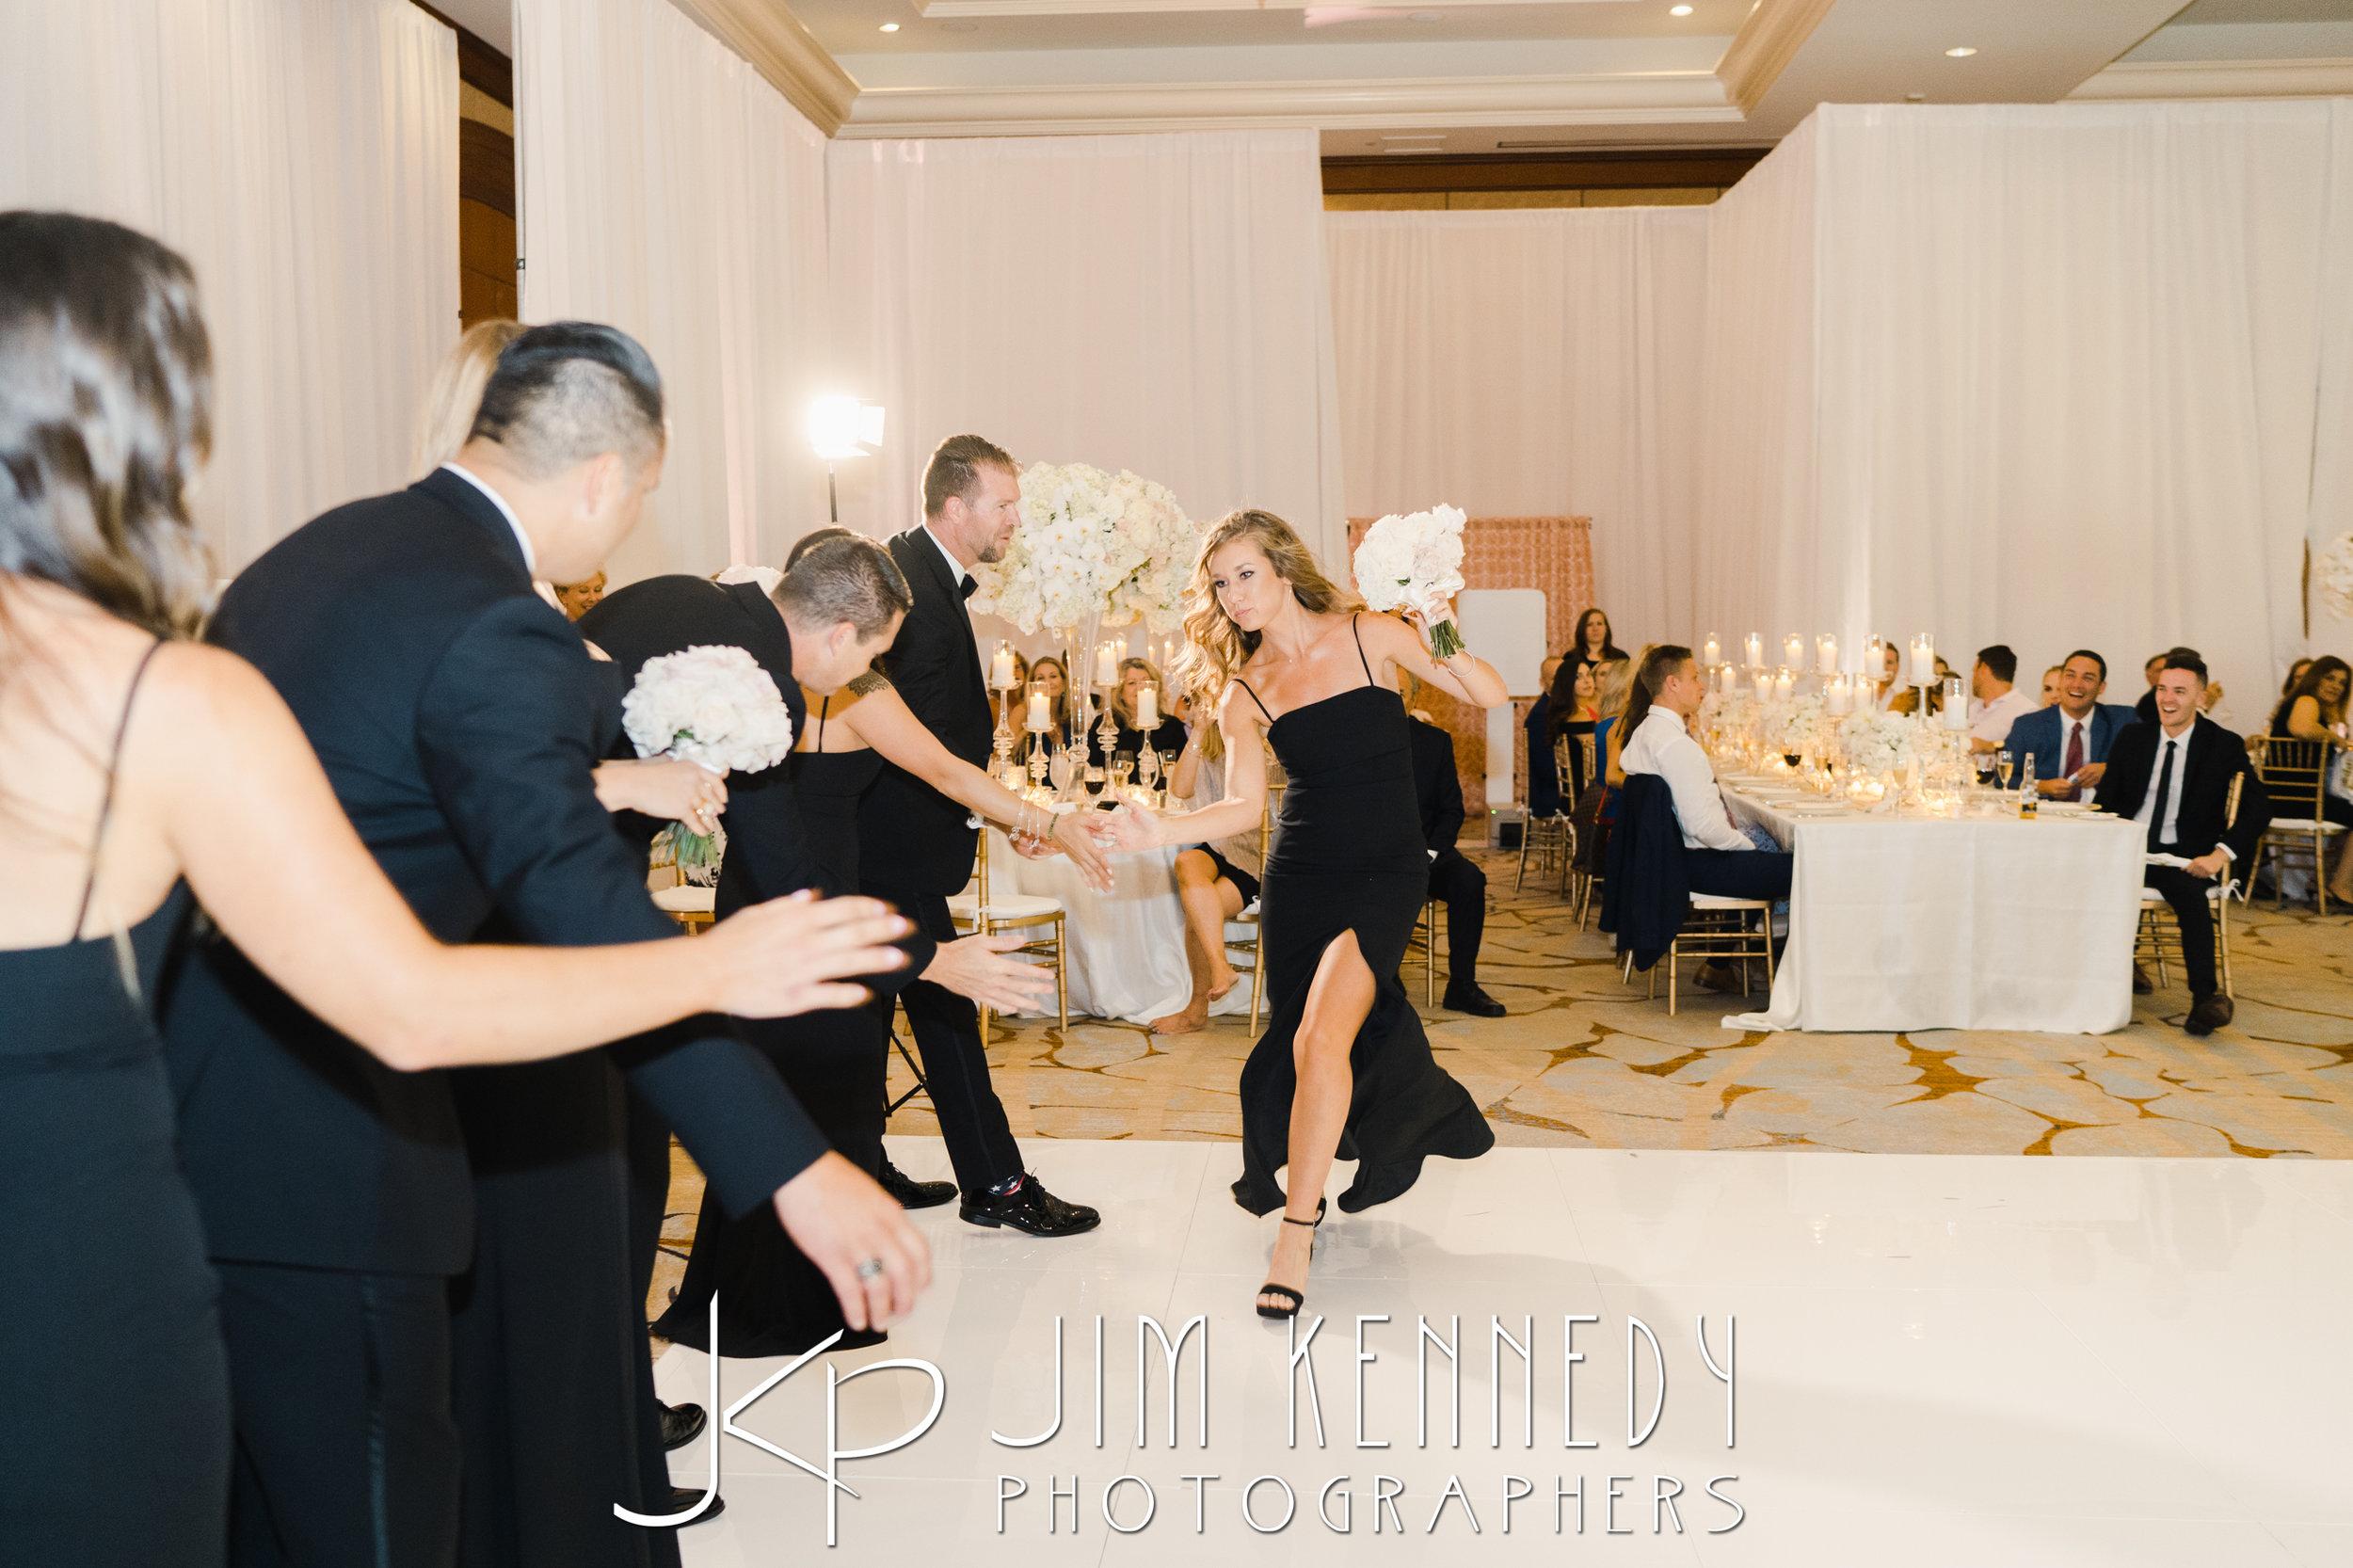 balboa-bay-resort-wedding-brooke-kevin_0223.JPG